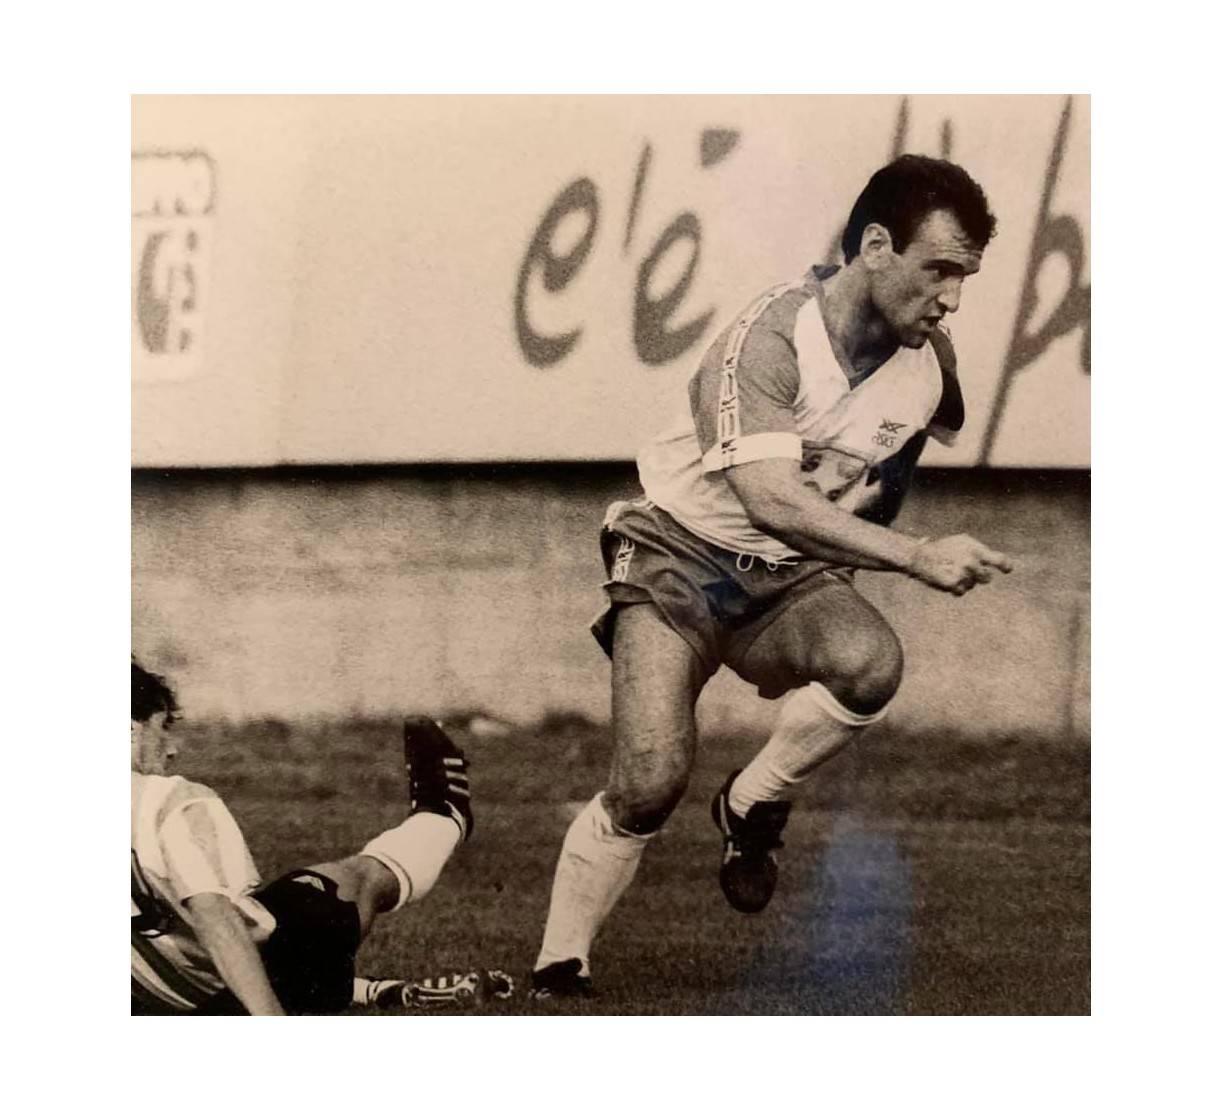 Fabio Baldi